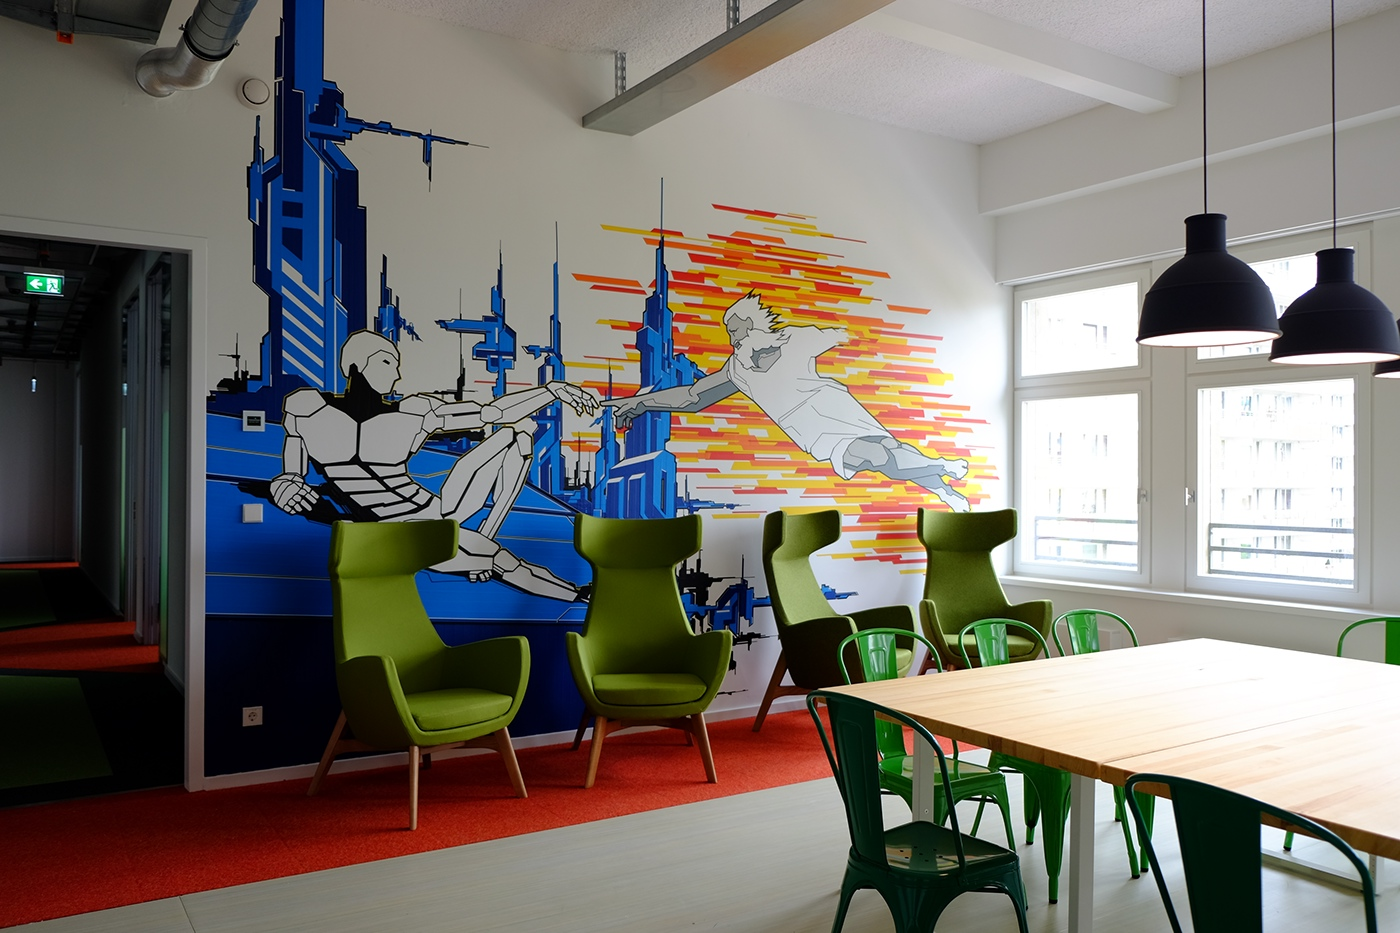 klebebande Tapeart art klebekunst Innenraumgestaltung Interior